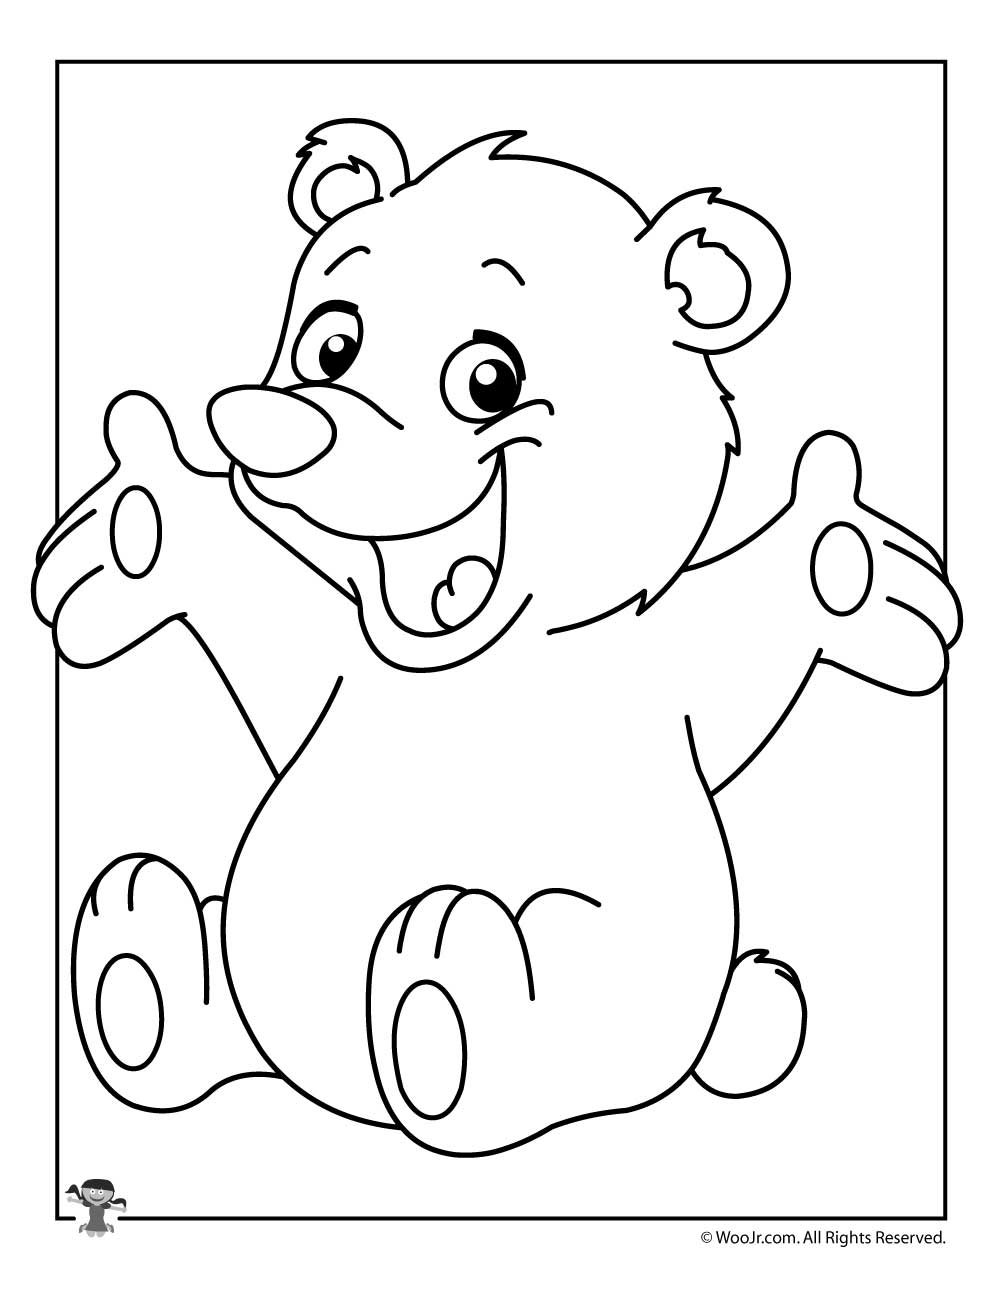 Cute Polar Bear Coloring Page Woo Jr Kids Activities